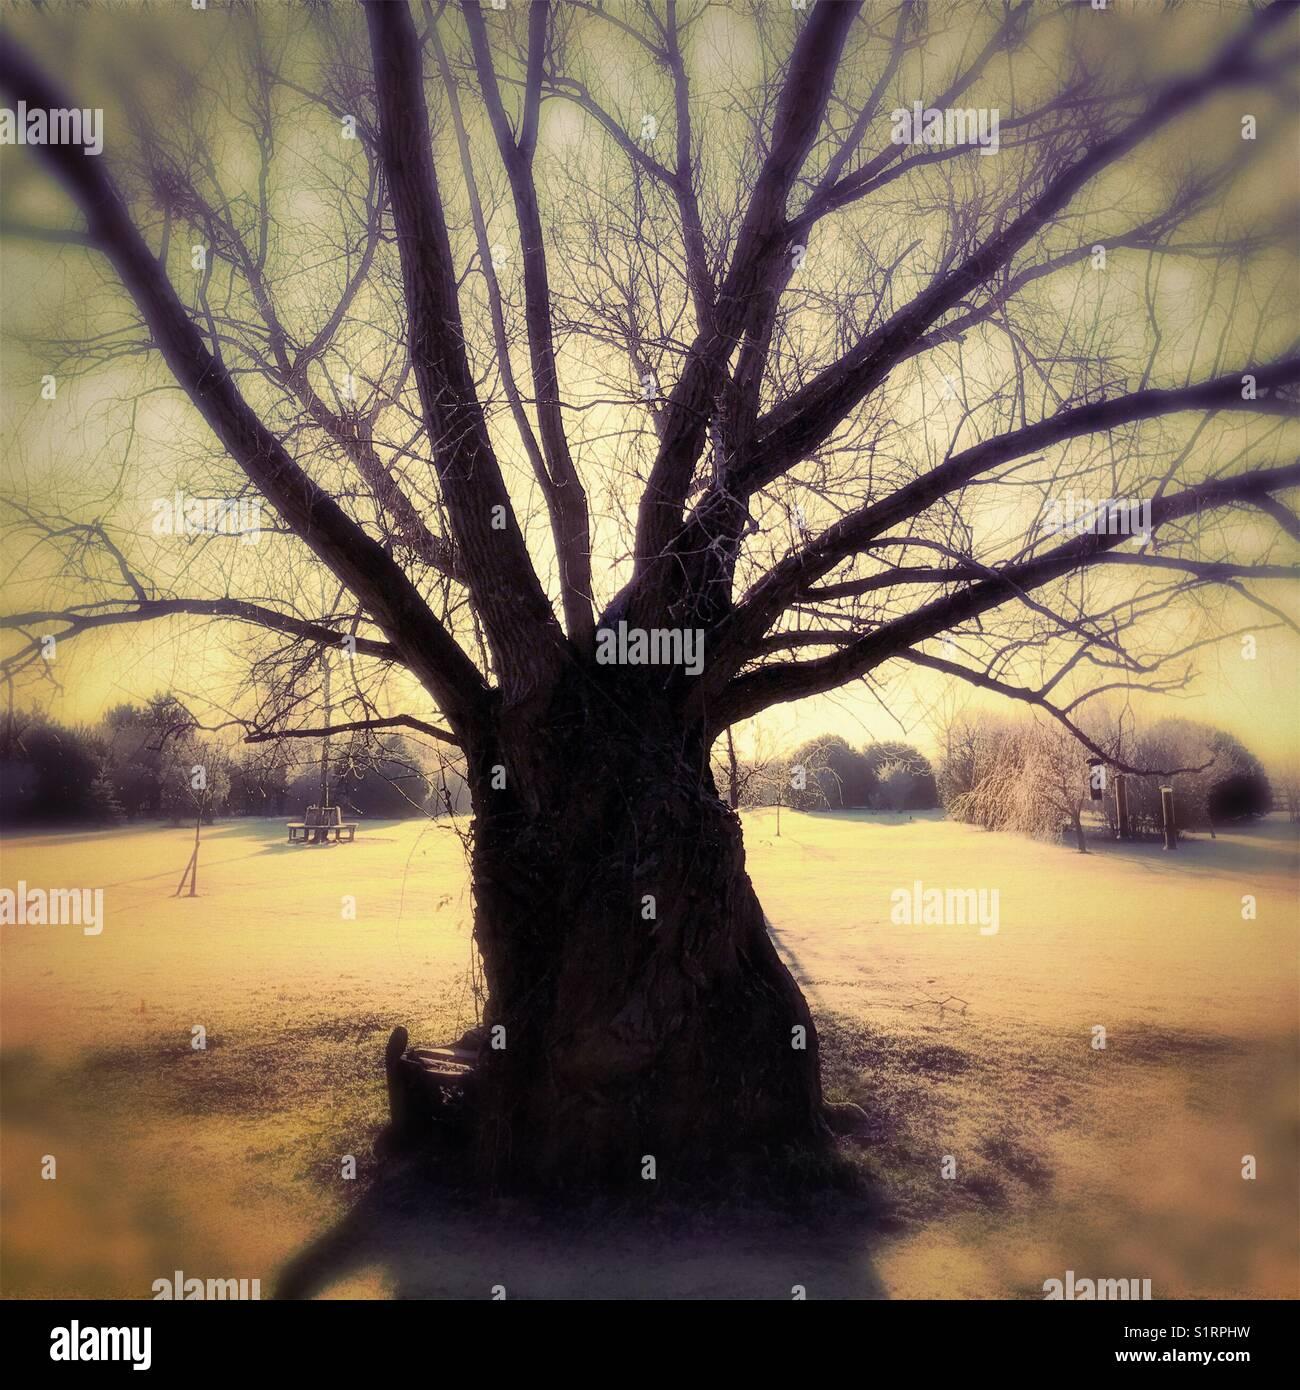 Willow tree silhouette - Stock Image